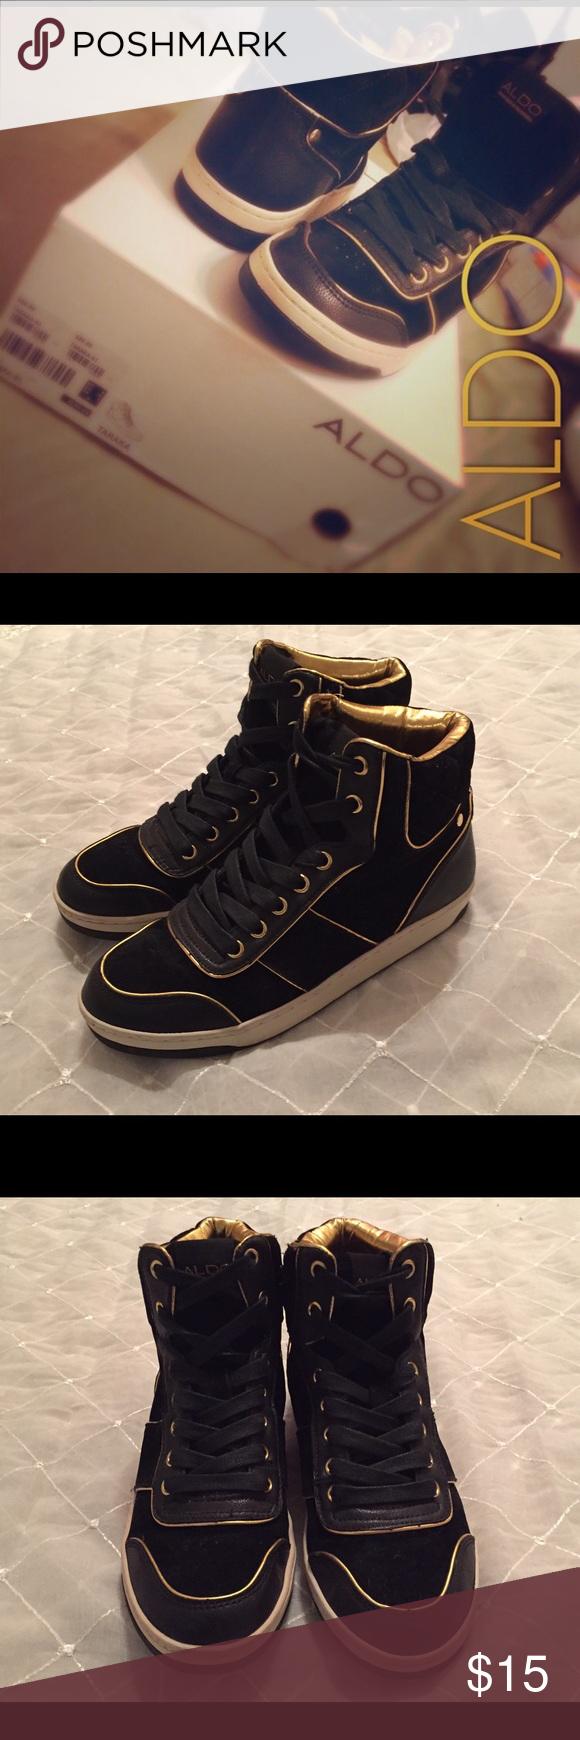 Sneakers, Aldo shoes